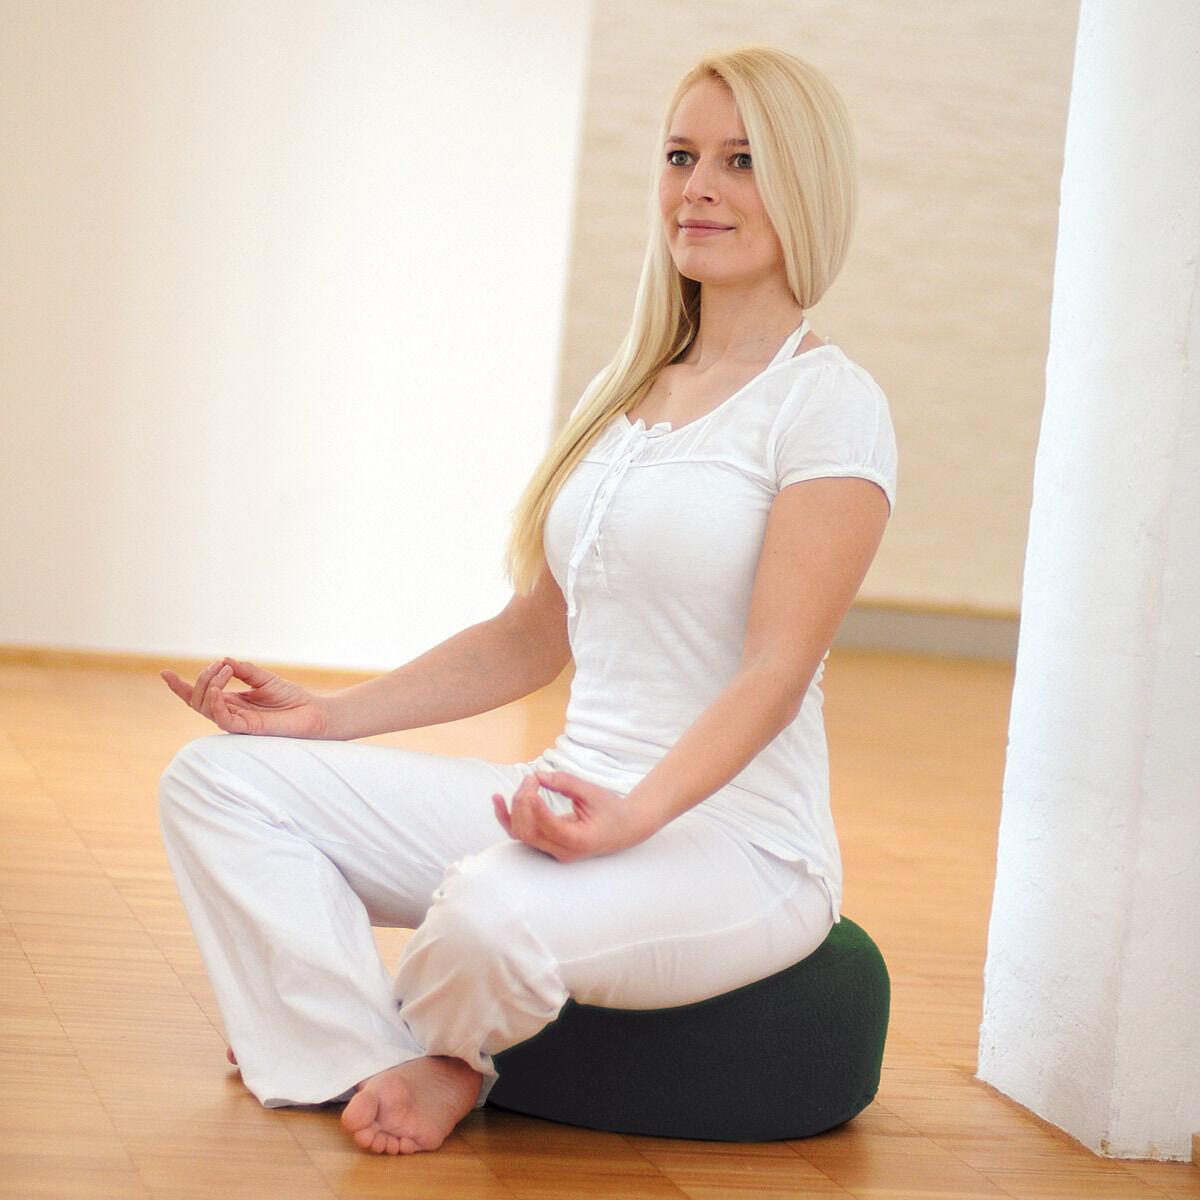 Cuscino Yoga Relax seduta meditazione o rilassamento  Comodo e pratico sedile